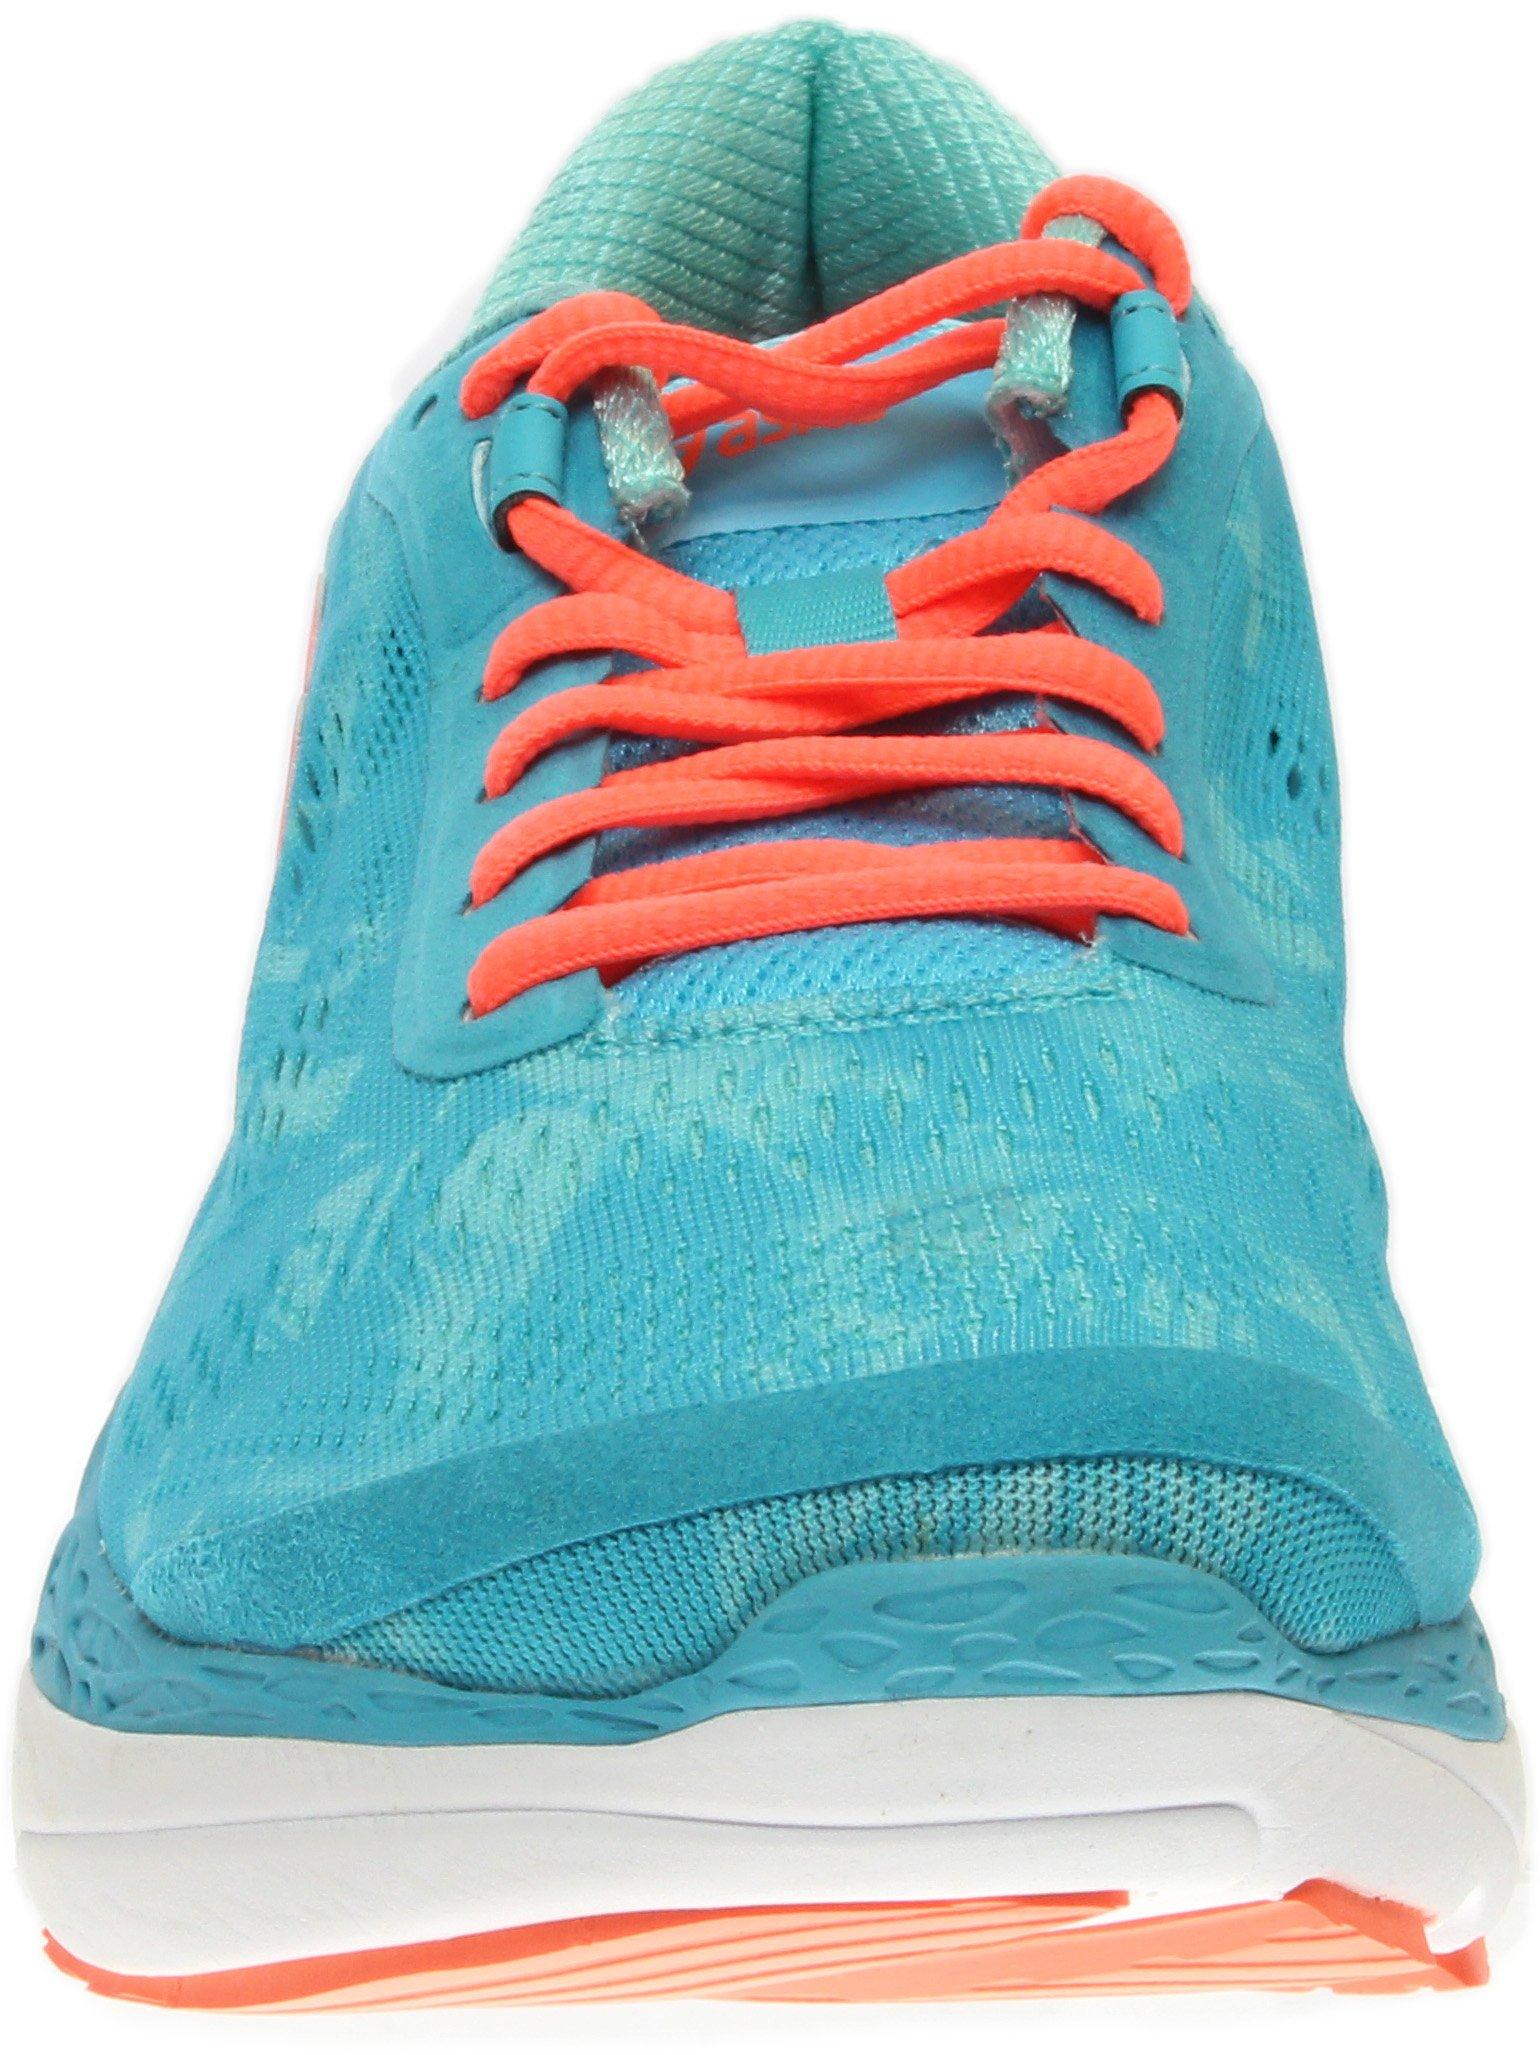 ASICS Women's 33-M 2 Running Shoe, Aquarium/Flash Coral/Aruba Blue, 9.5 M US by ASICS (Image #5)